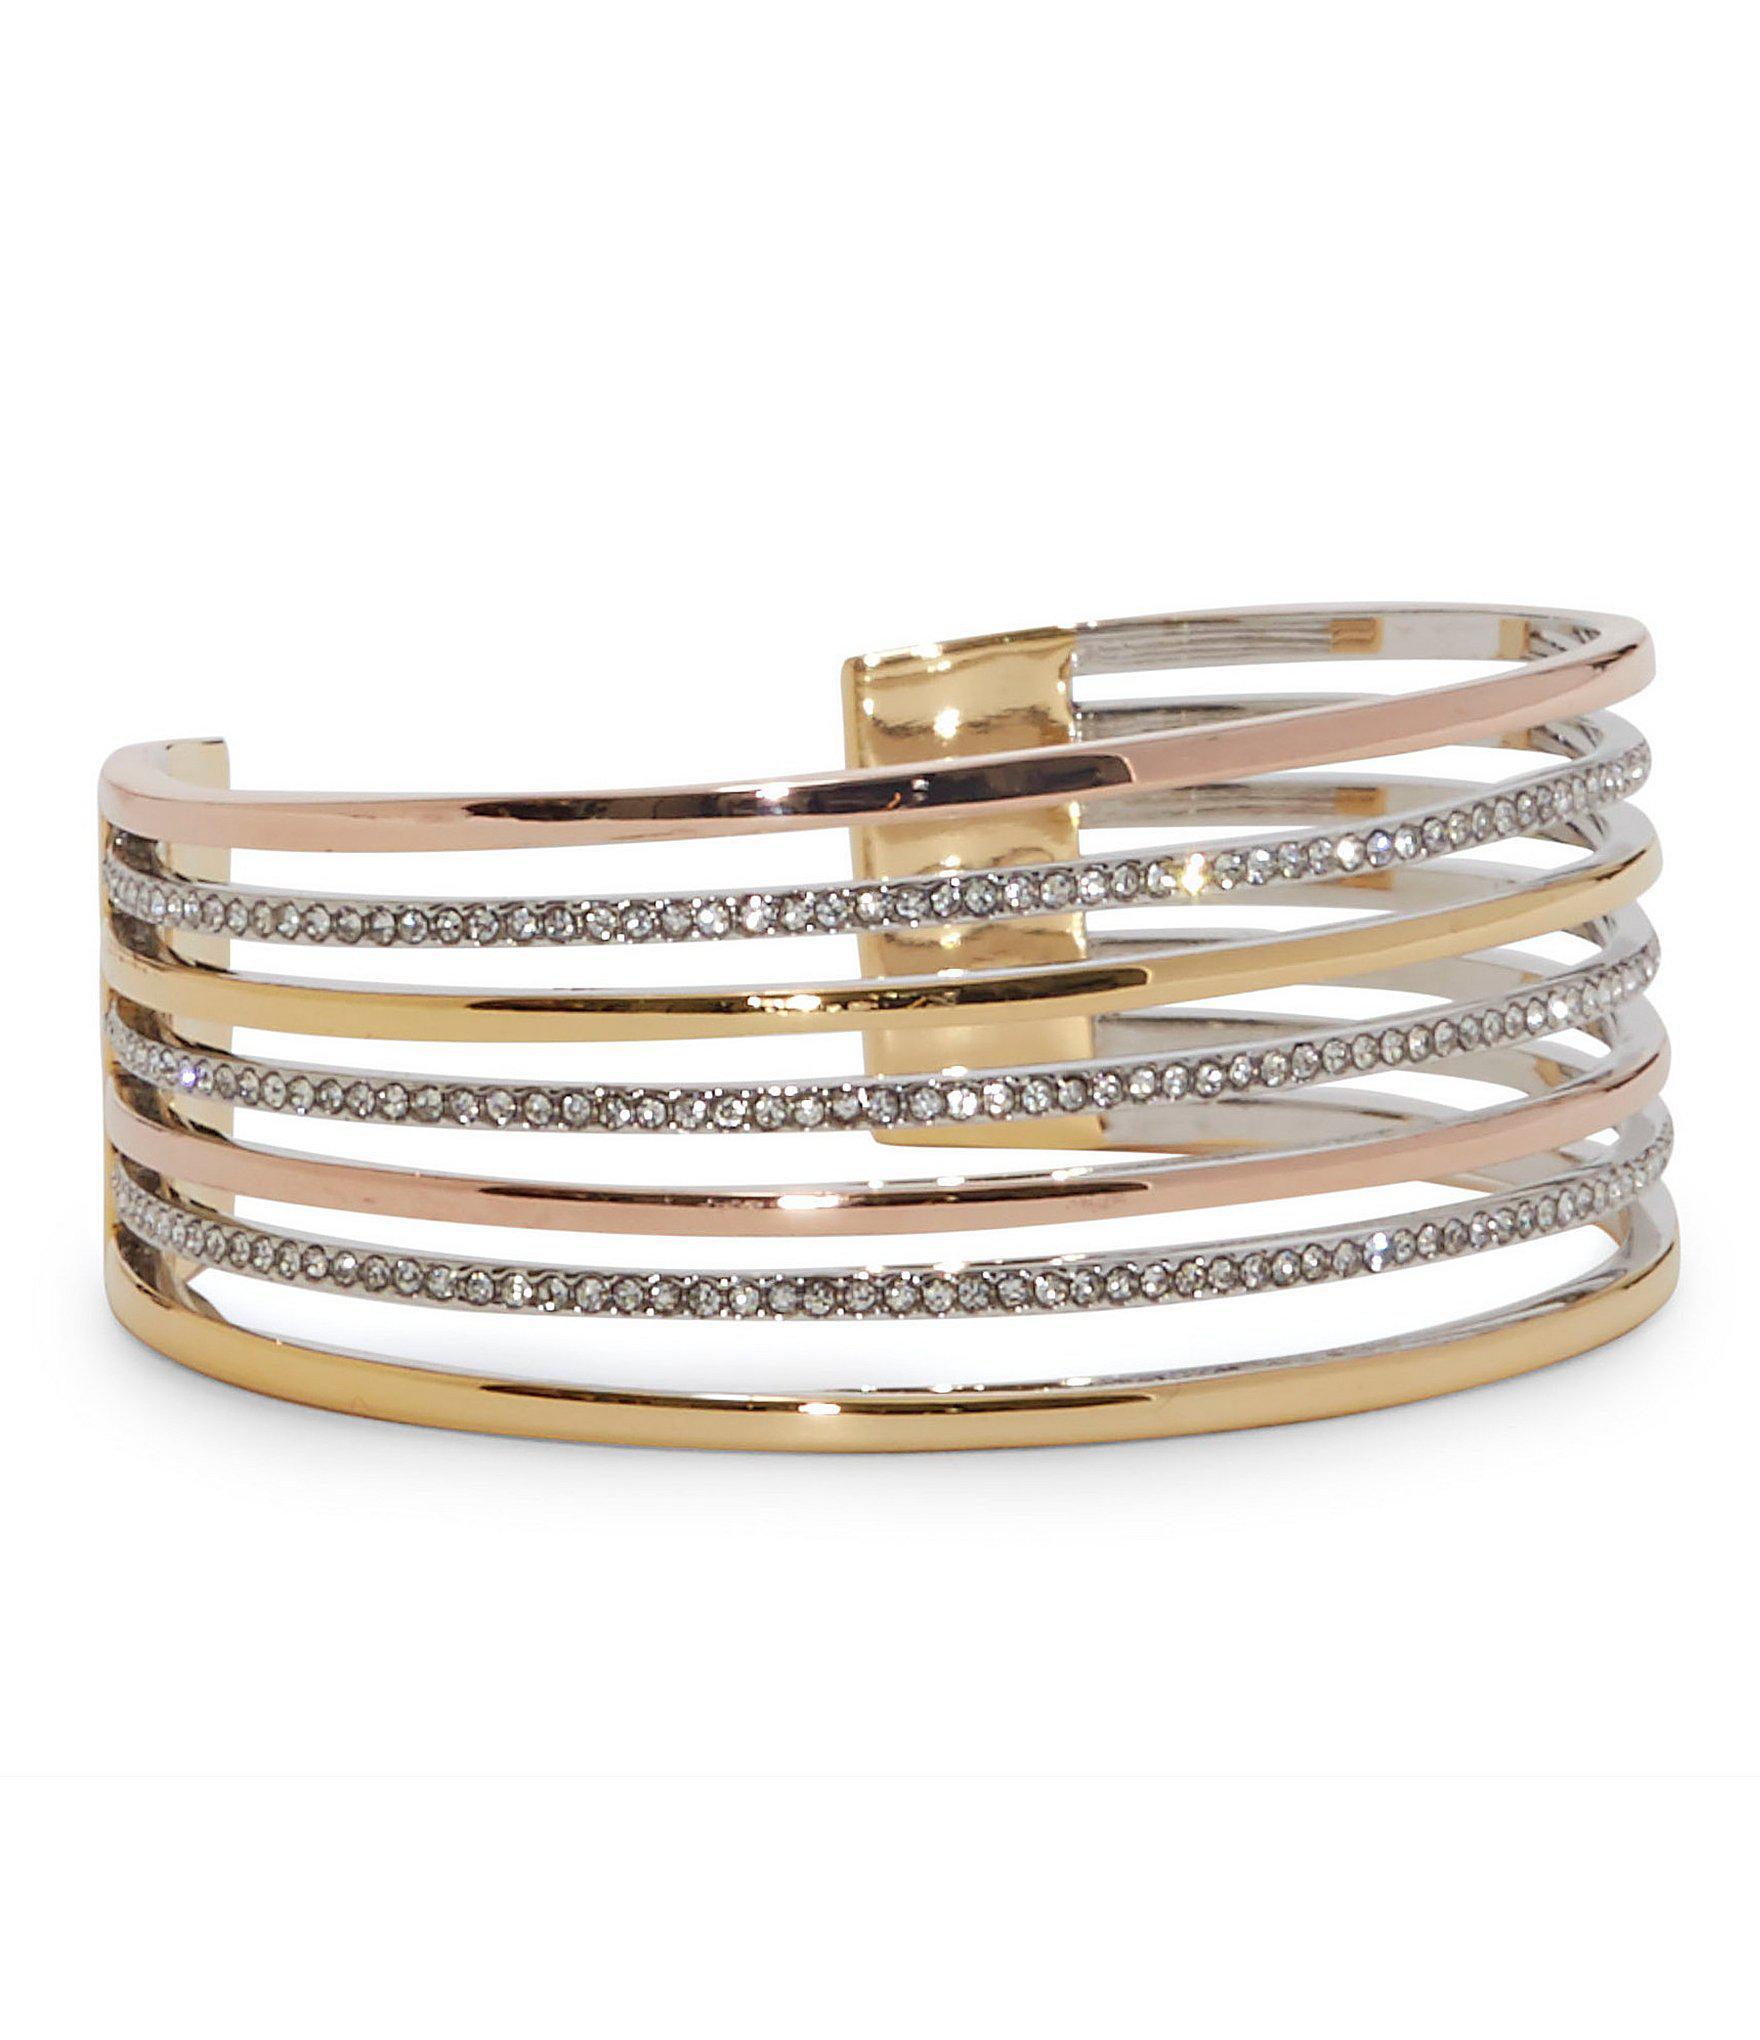 Vince Camuto Metallic Cuff Bracelet Lyst View Fullscreen